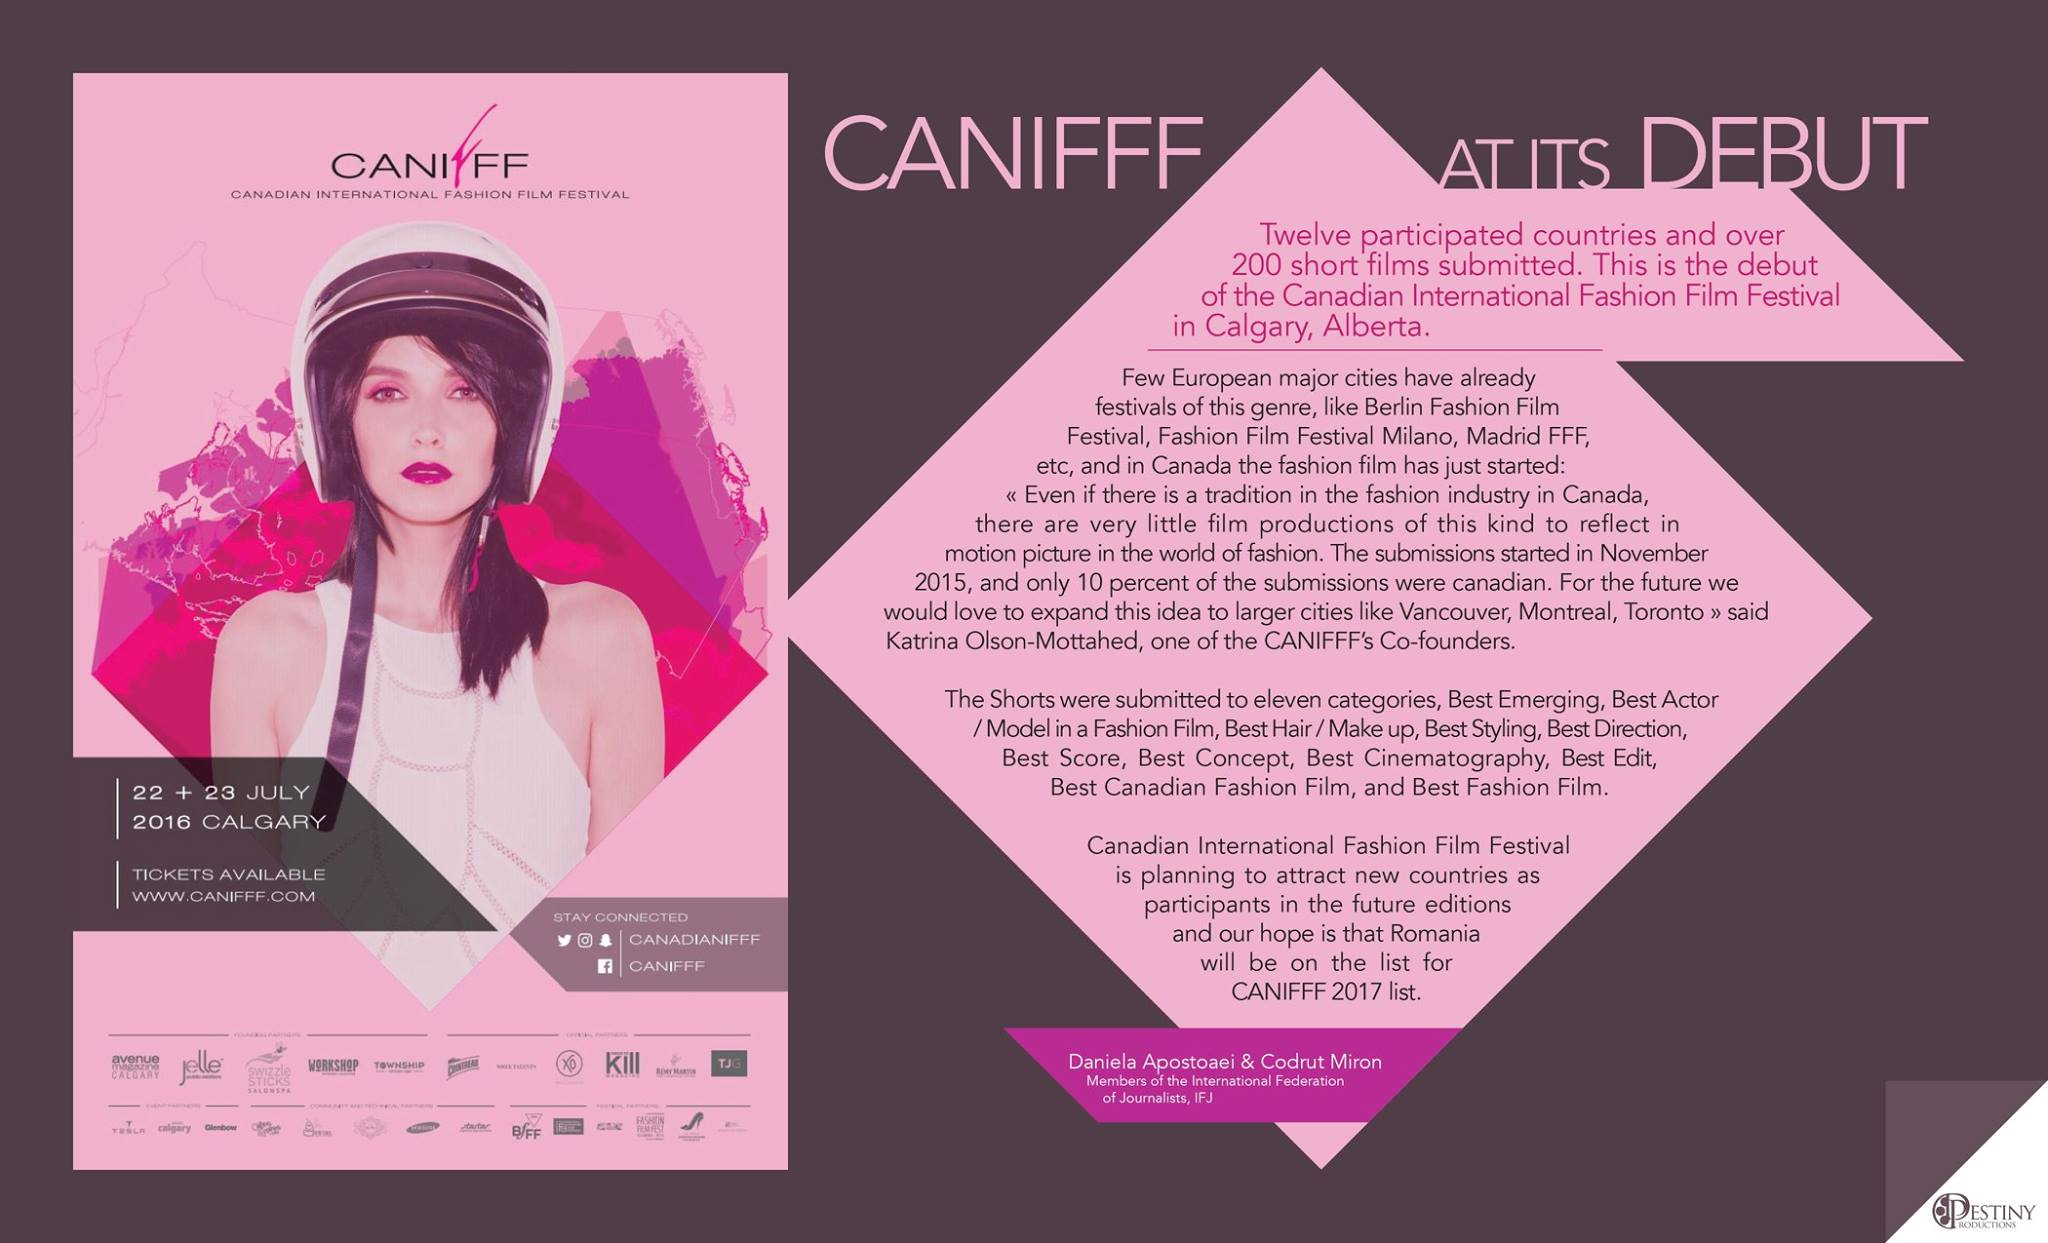 Canadian International Fashion Film Festival article by Daniela Cupse Apostoaei and Codrut Miron